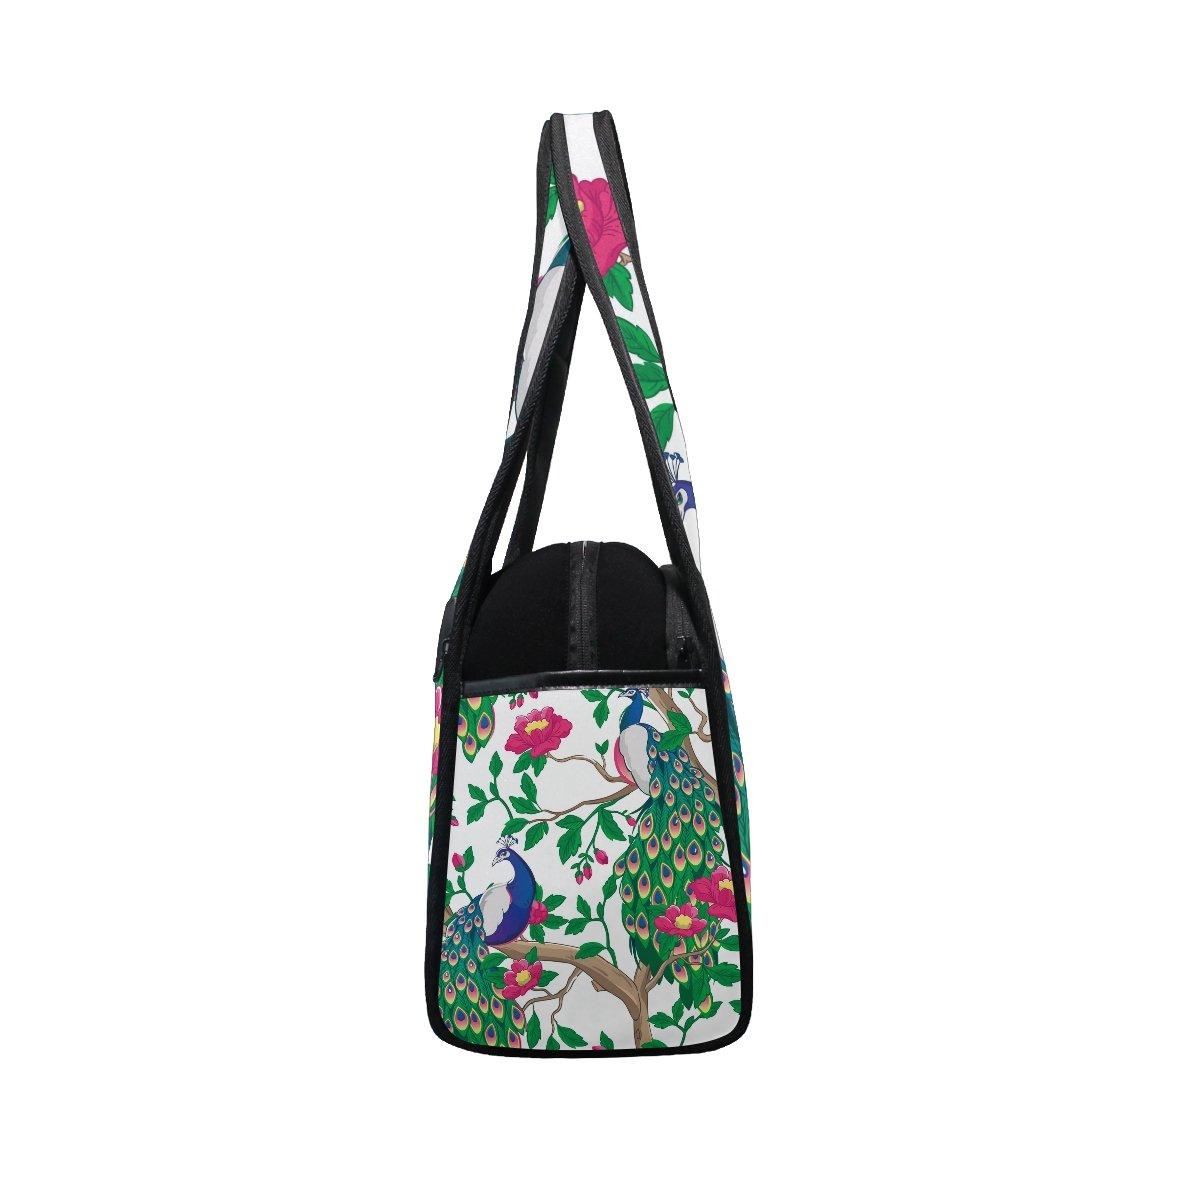 AHOMY Canvas Sports Gym Bag Peacock Branches Flower Travel Shoulder Bag